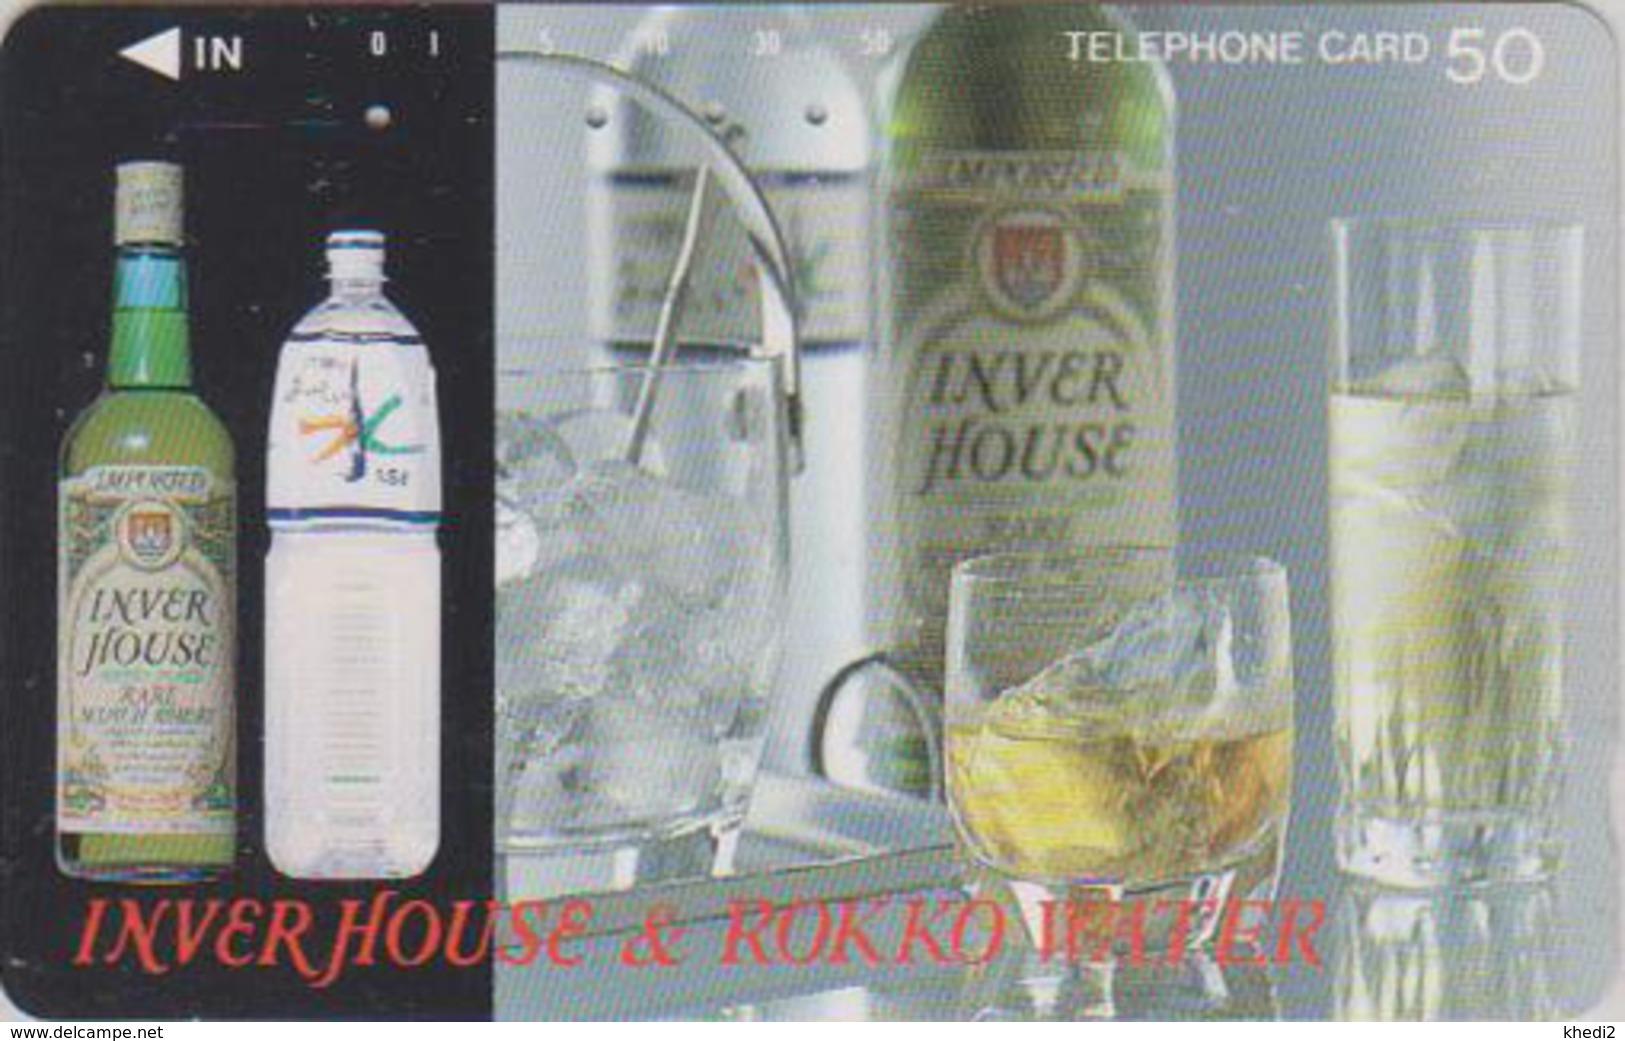 Télécarte Japon / 110-011 - ALCOOL - WHISKY - INVER HOUSE & ROKKO WATER SCOTLAND - ALCOHOL Japan Phonecard - 901 - Lebensmittel